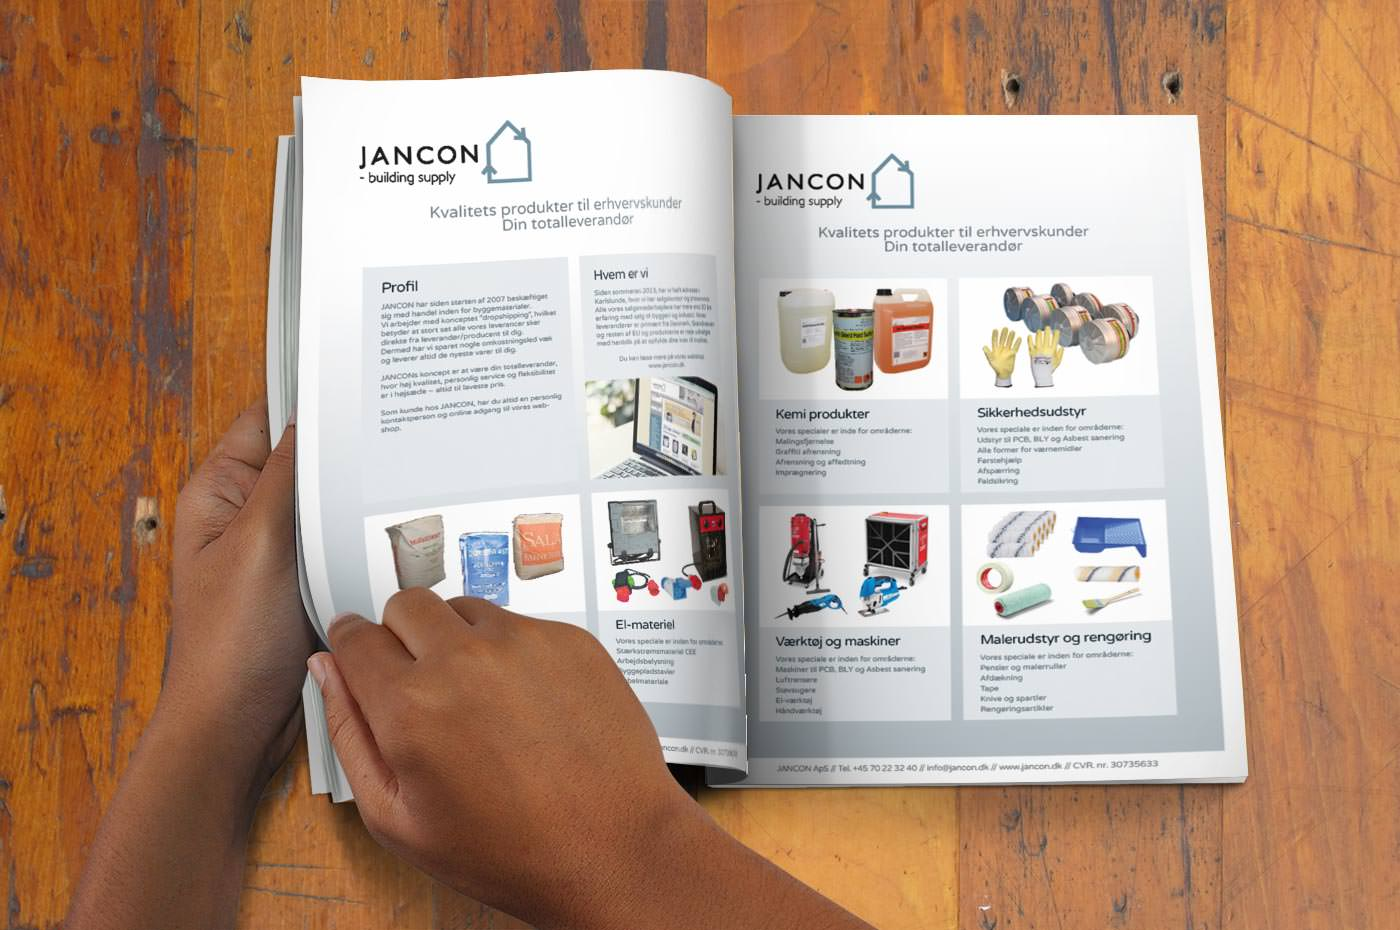 Jancon